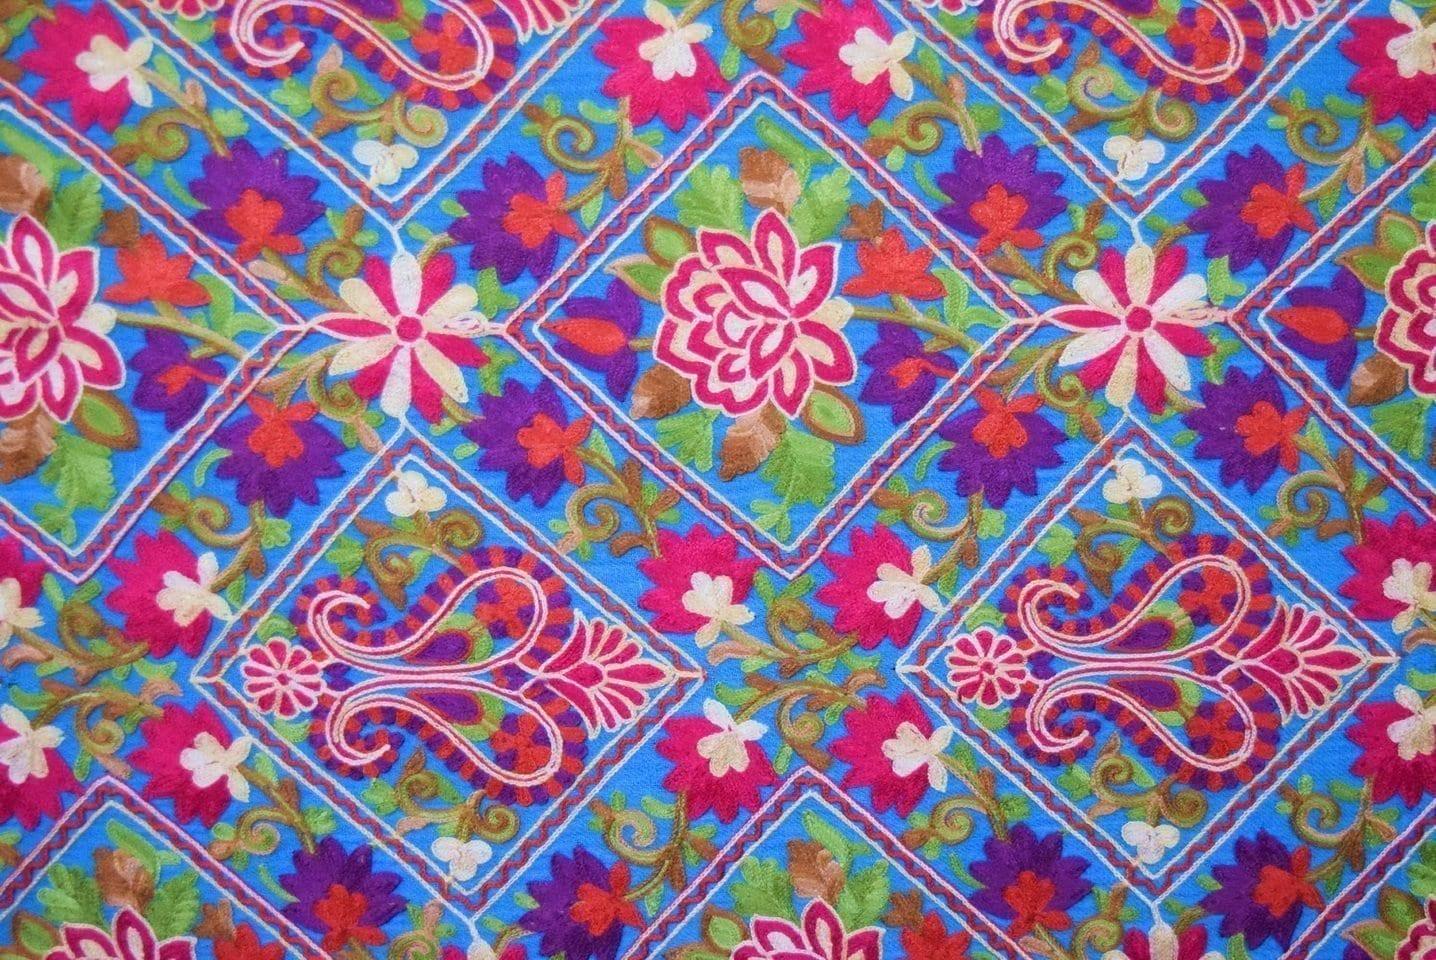 Firozi Kashmiri Stole Multicolour Heavy Embroidery Work pure wool Pashmina C0685 2